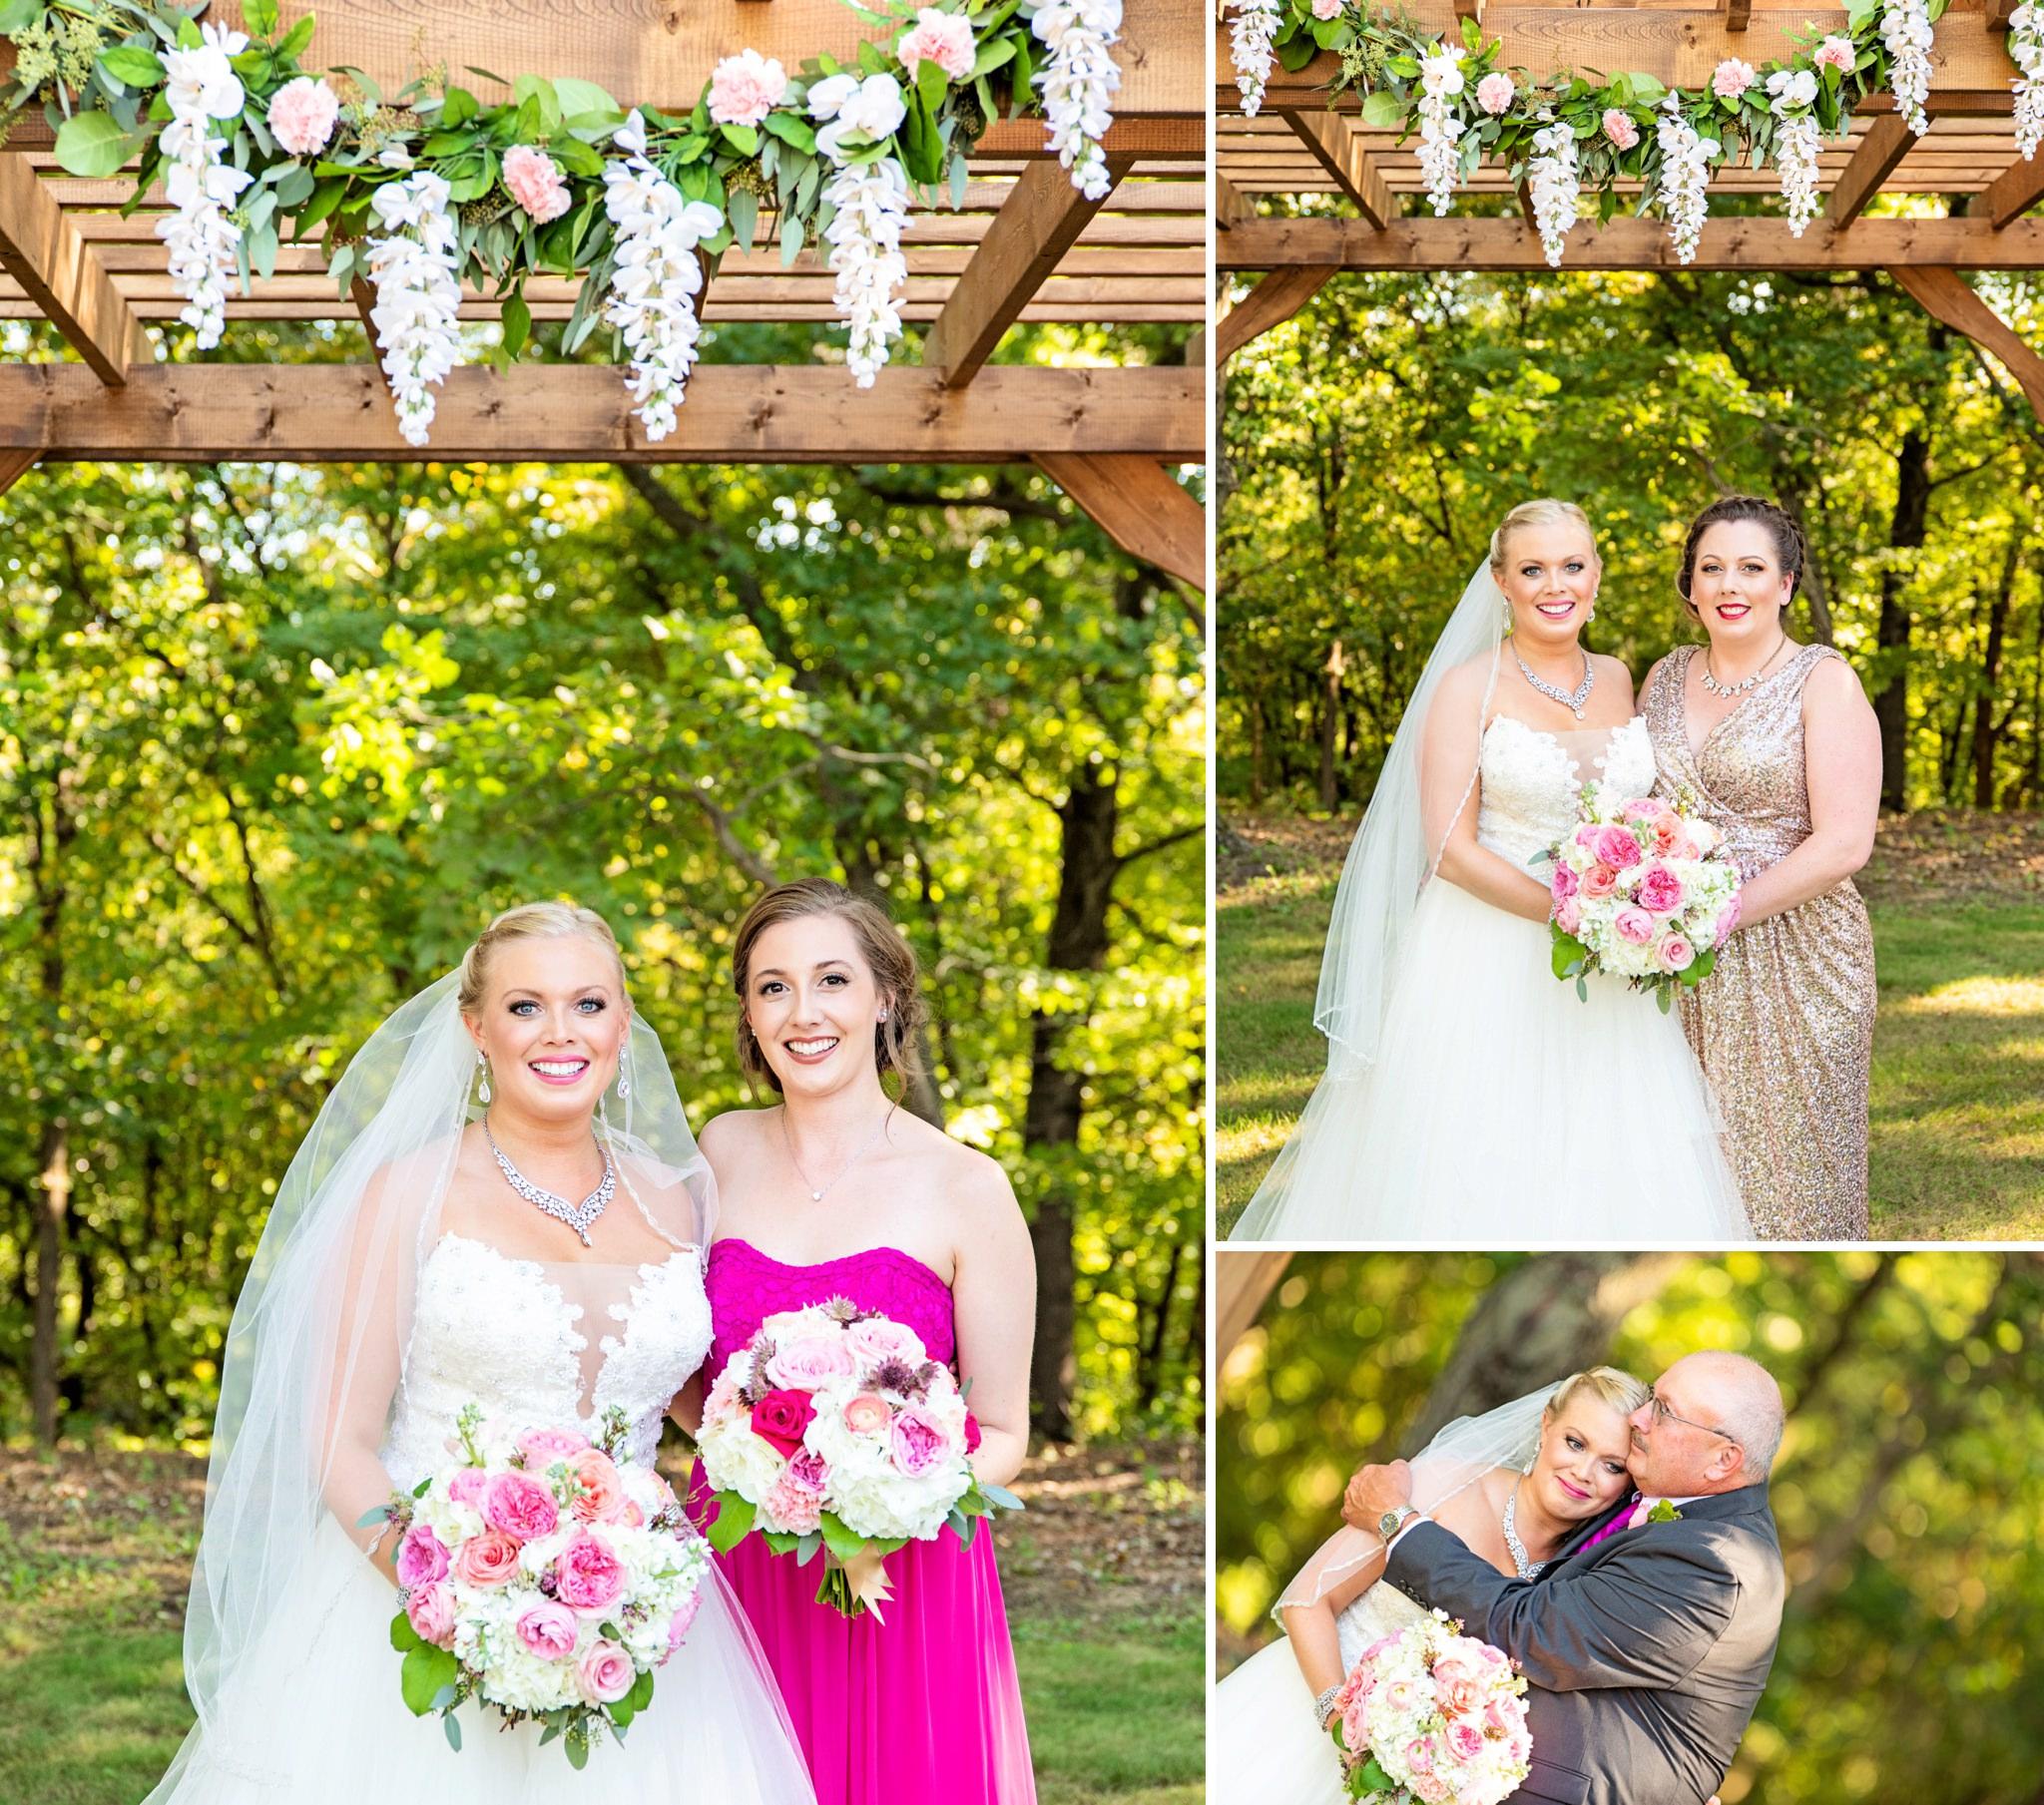 Brittany-Jay-Wedding-091518-Rotella-Photography-17_BLOG.jpg